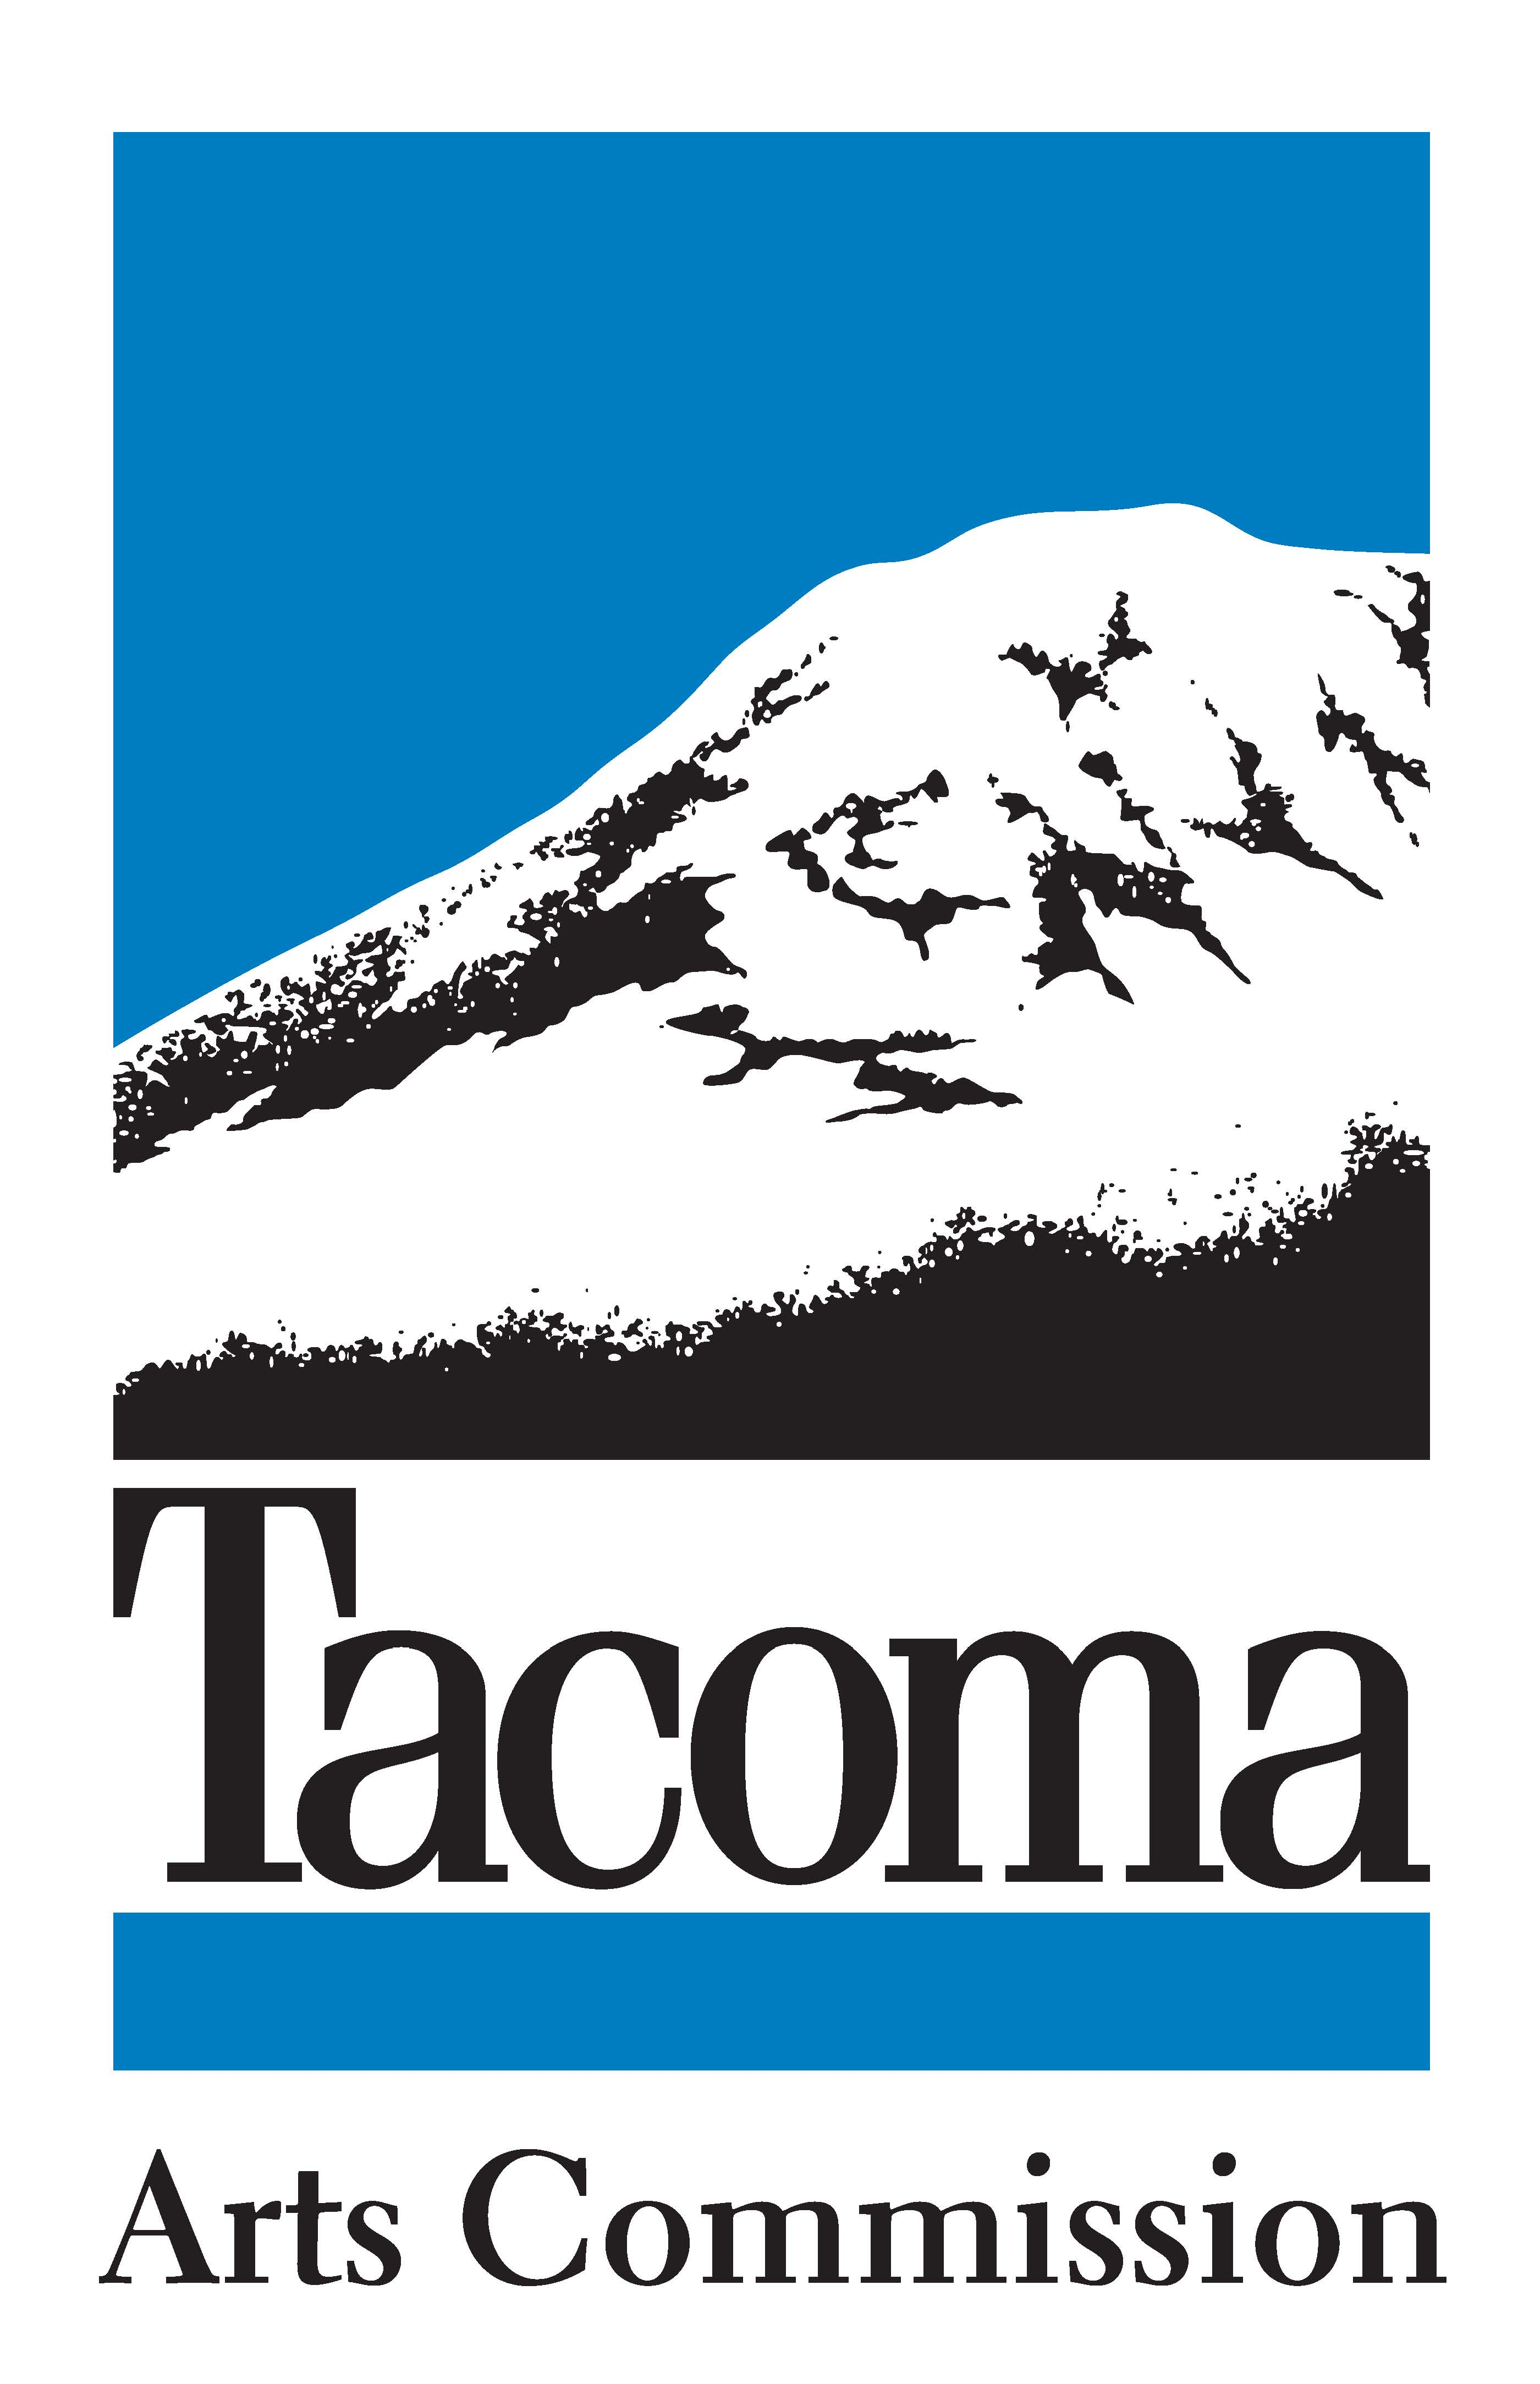 TAC logo vector file